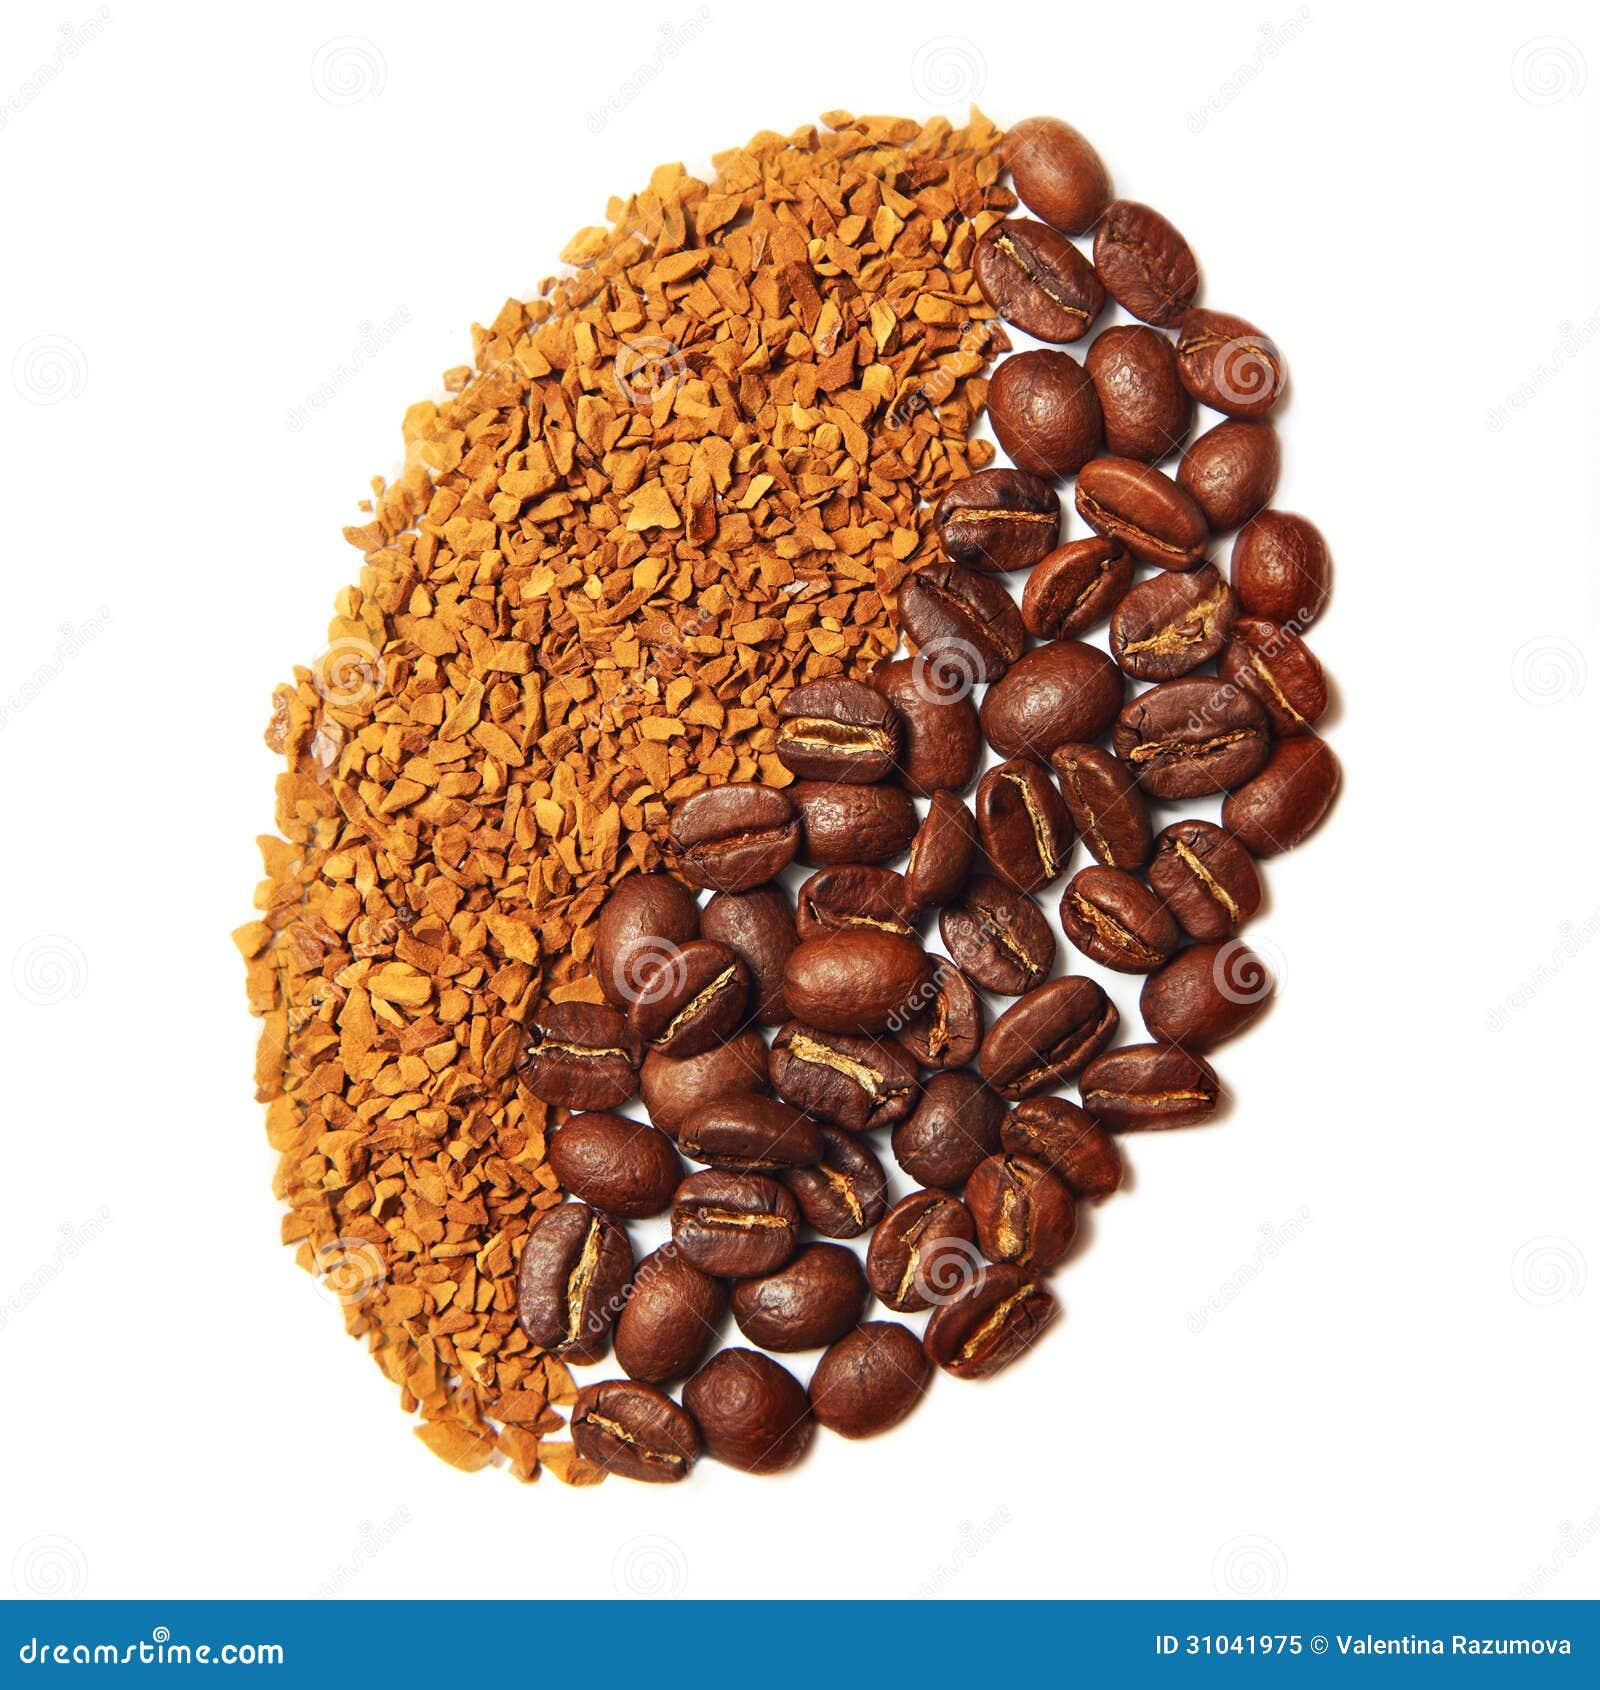 coffee grain royalty free stock photo image 31041975. Black Bedroom Furniture Sets. Home Design Ideas